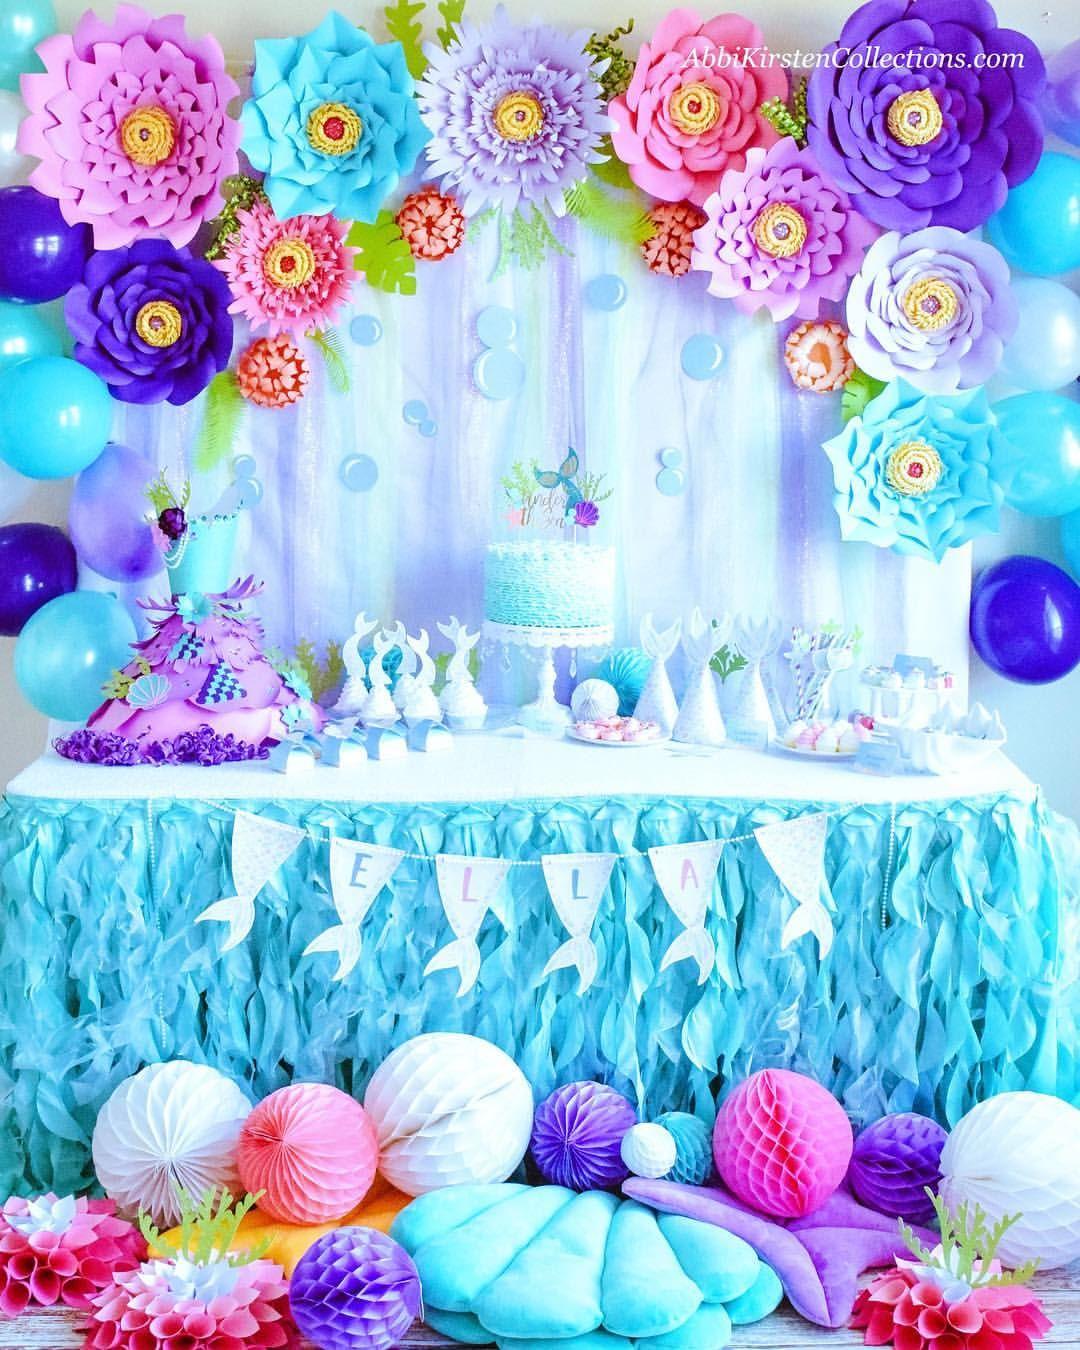 Mermaid Paradise Party Decor. Mermaid Party Ideas. Giant